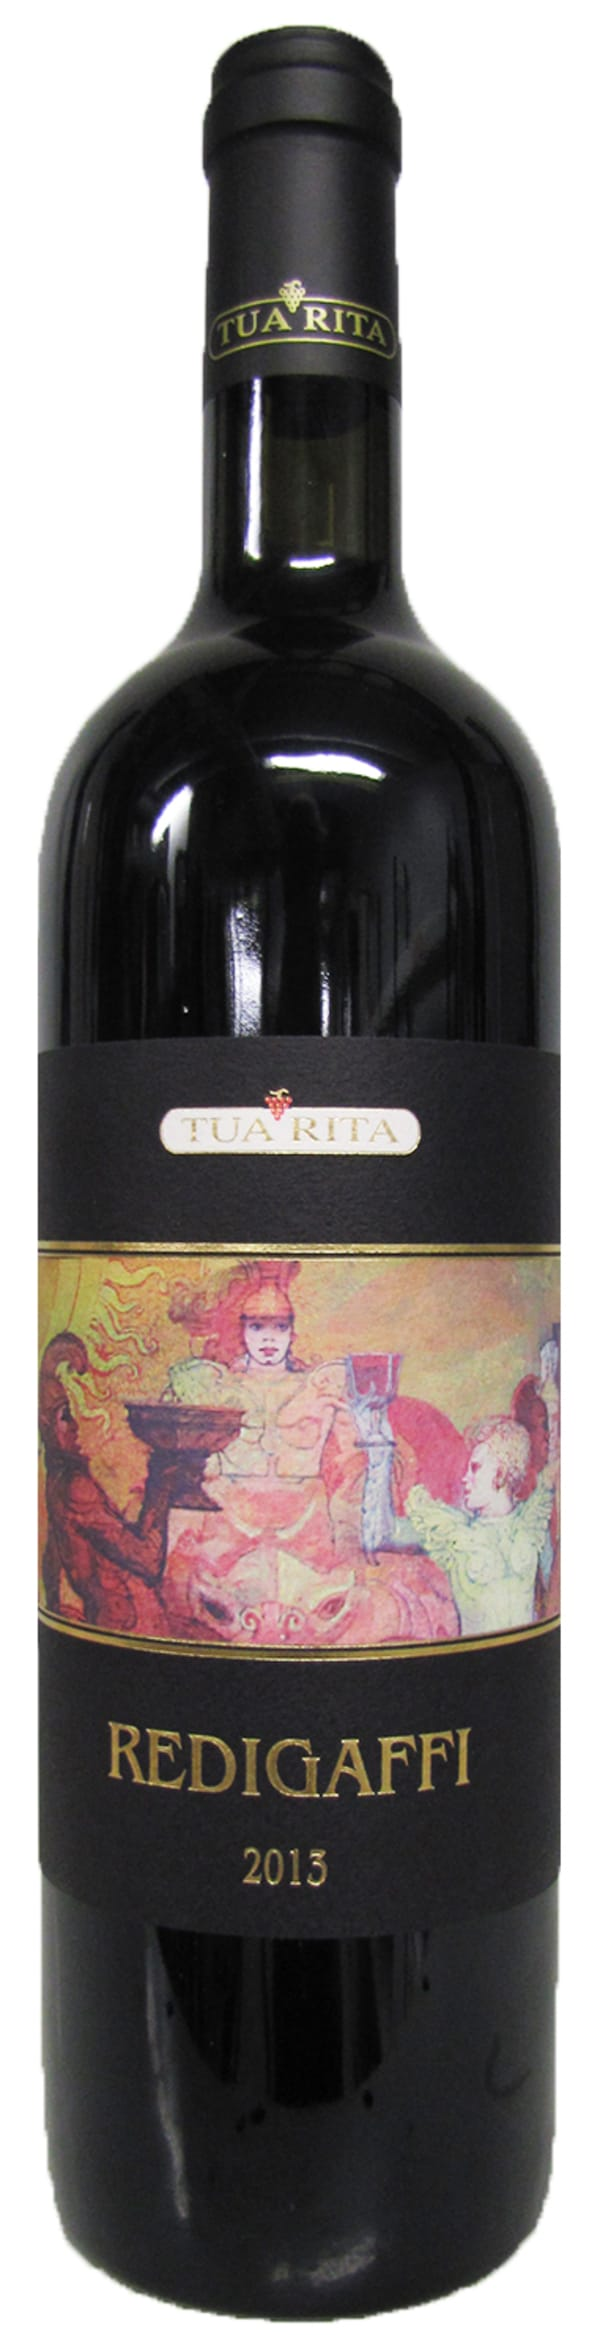 Tua Rita Redigaffi 2013